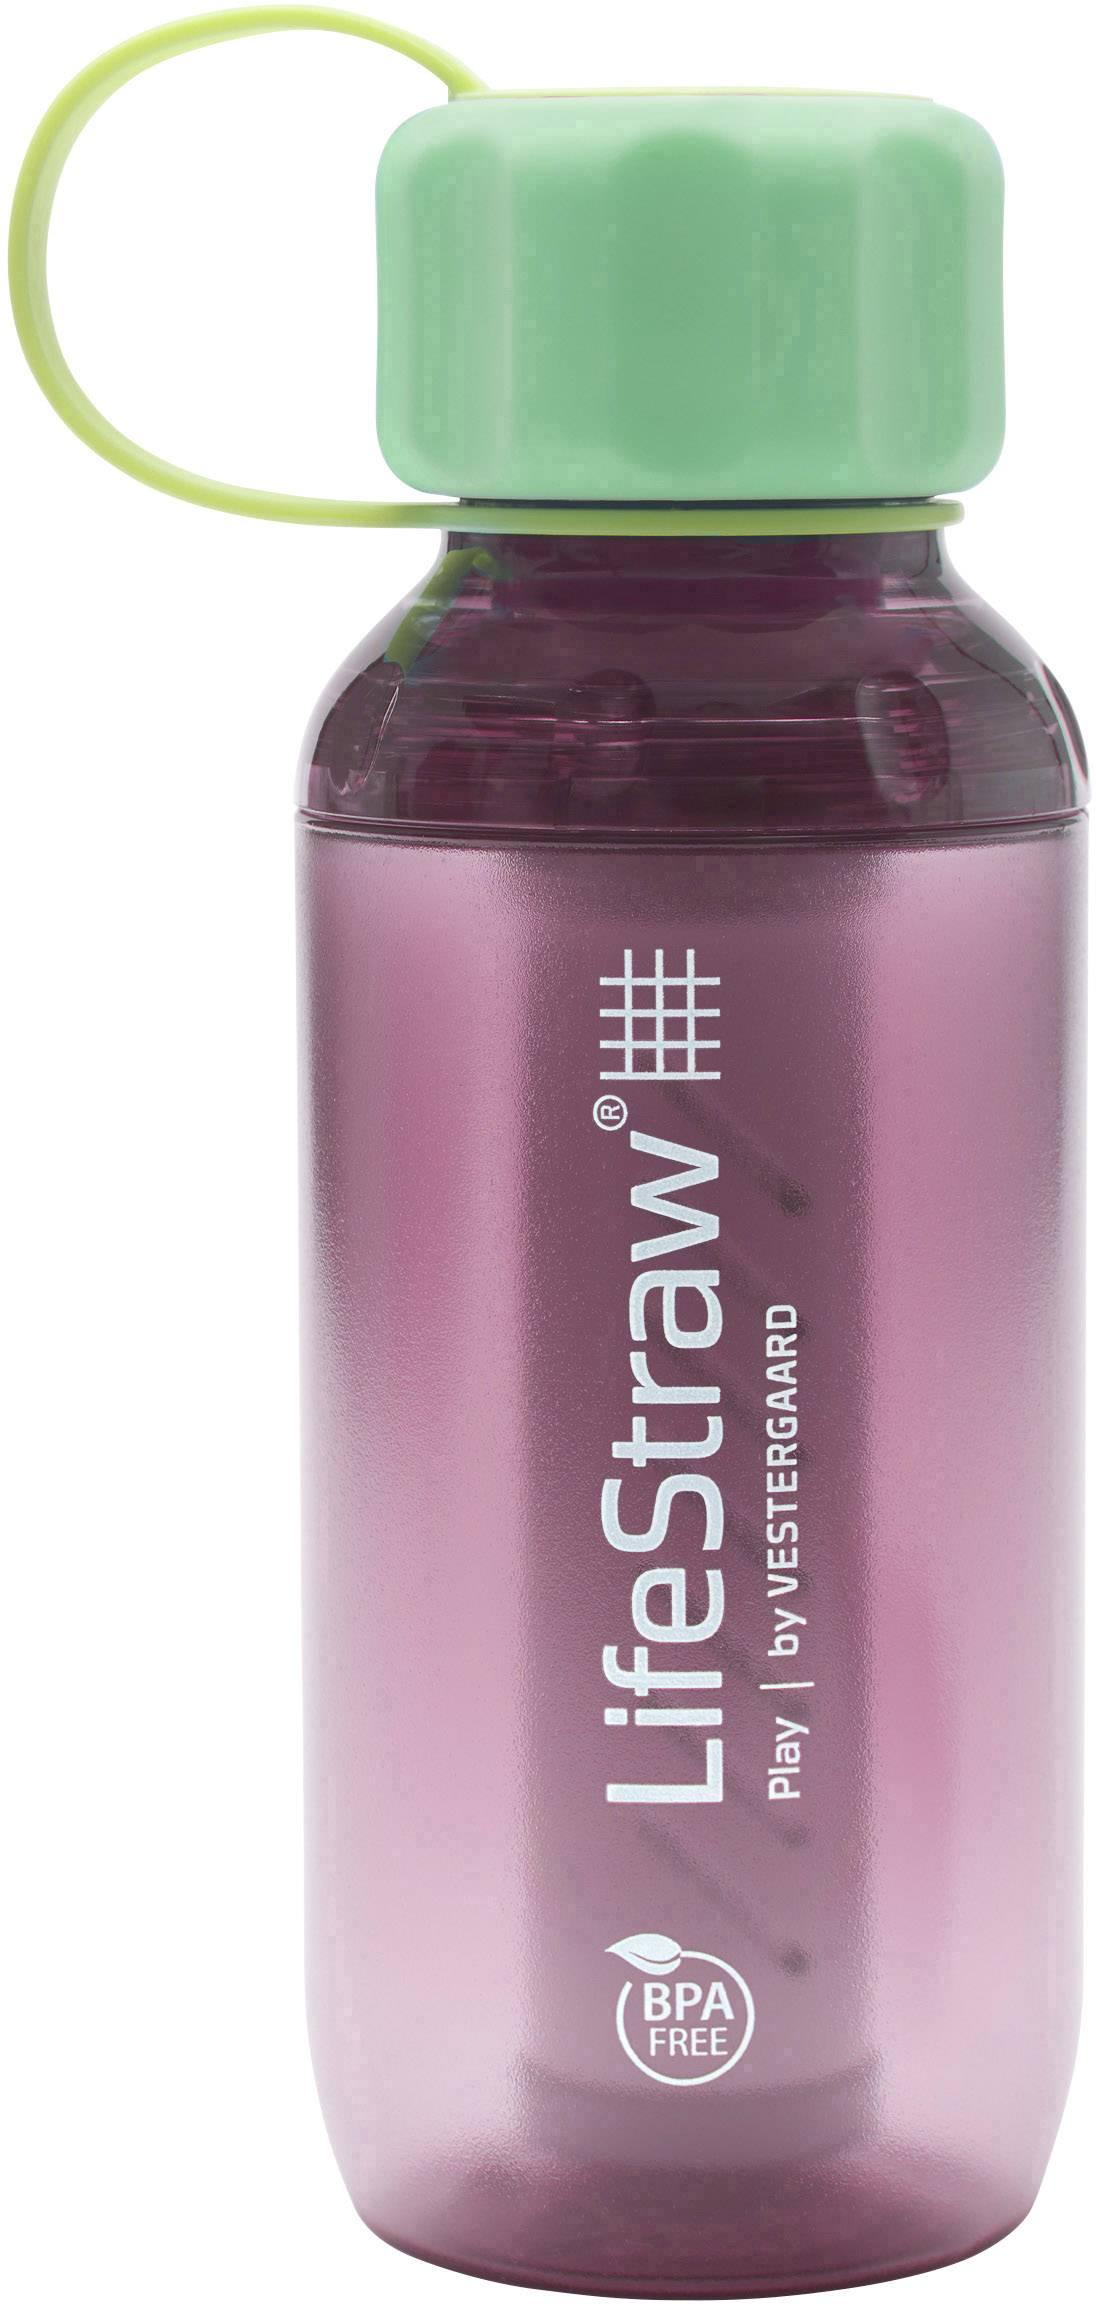 LifeStraw vodní filtr plast 006-6002126 Play 2-Stufig (wildberry)